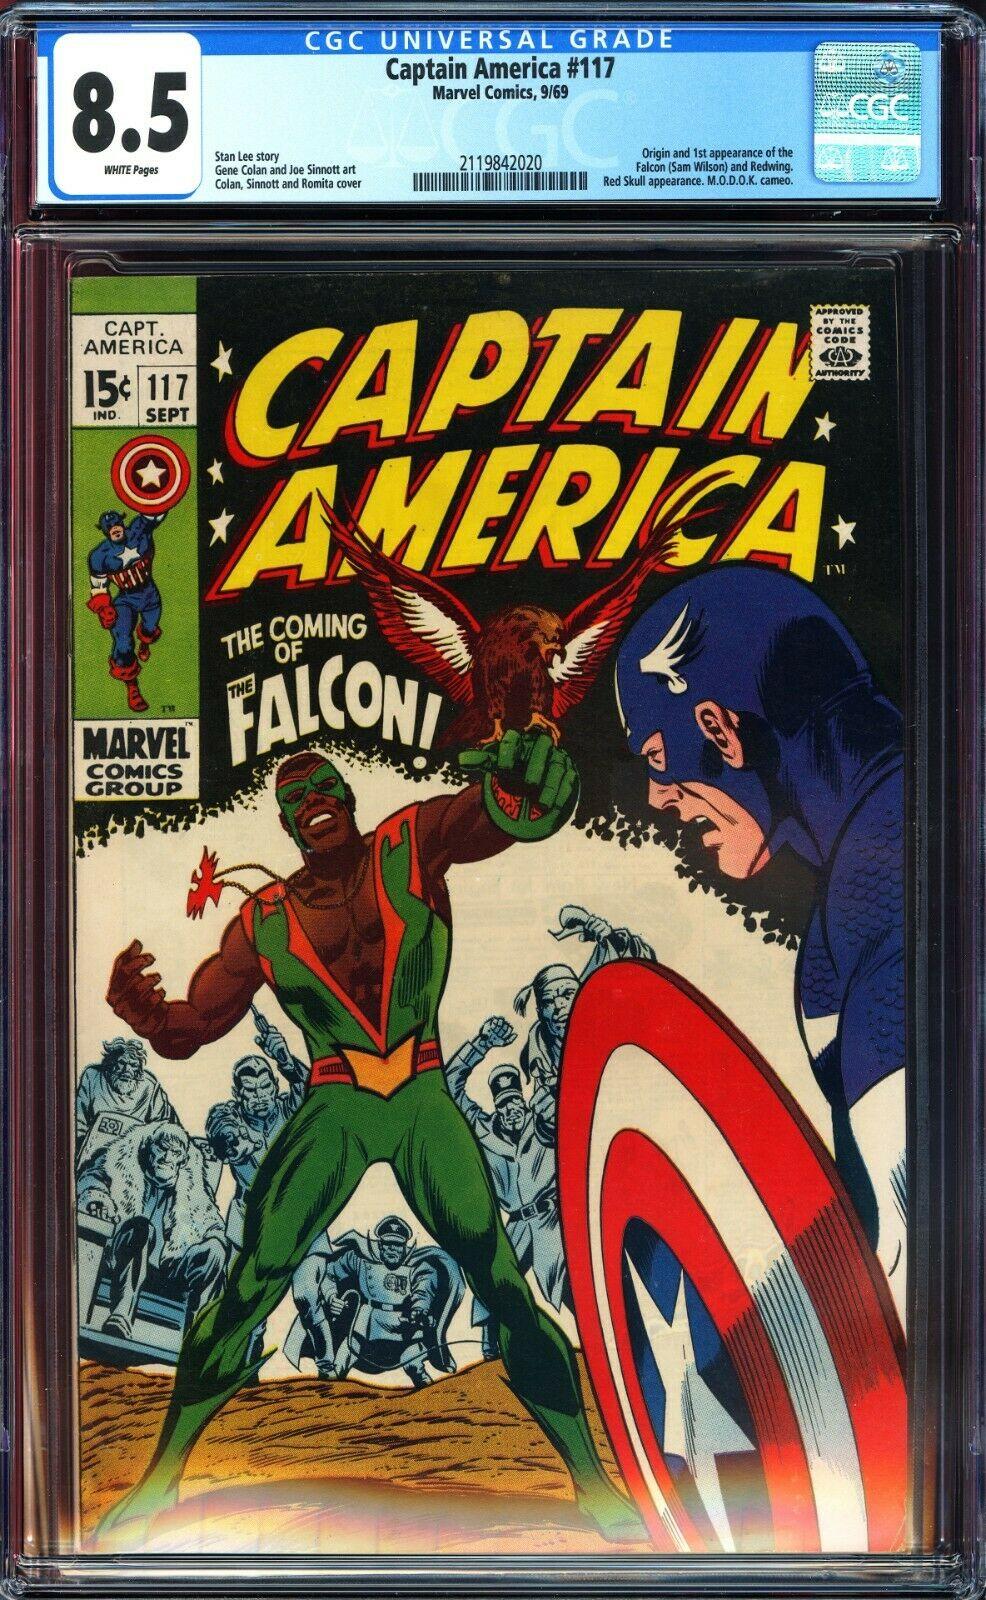 Captain America #117 CGC 8.5 & #118 CGC 8.0 & #119 CGC 9.0 1st,2nd & 3rd Falcon